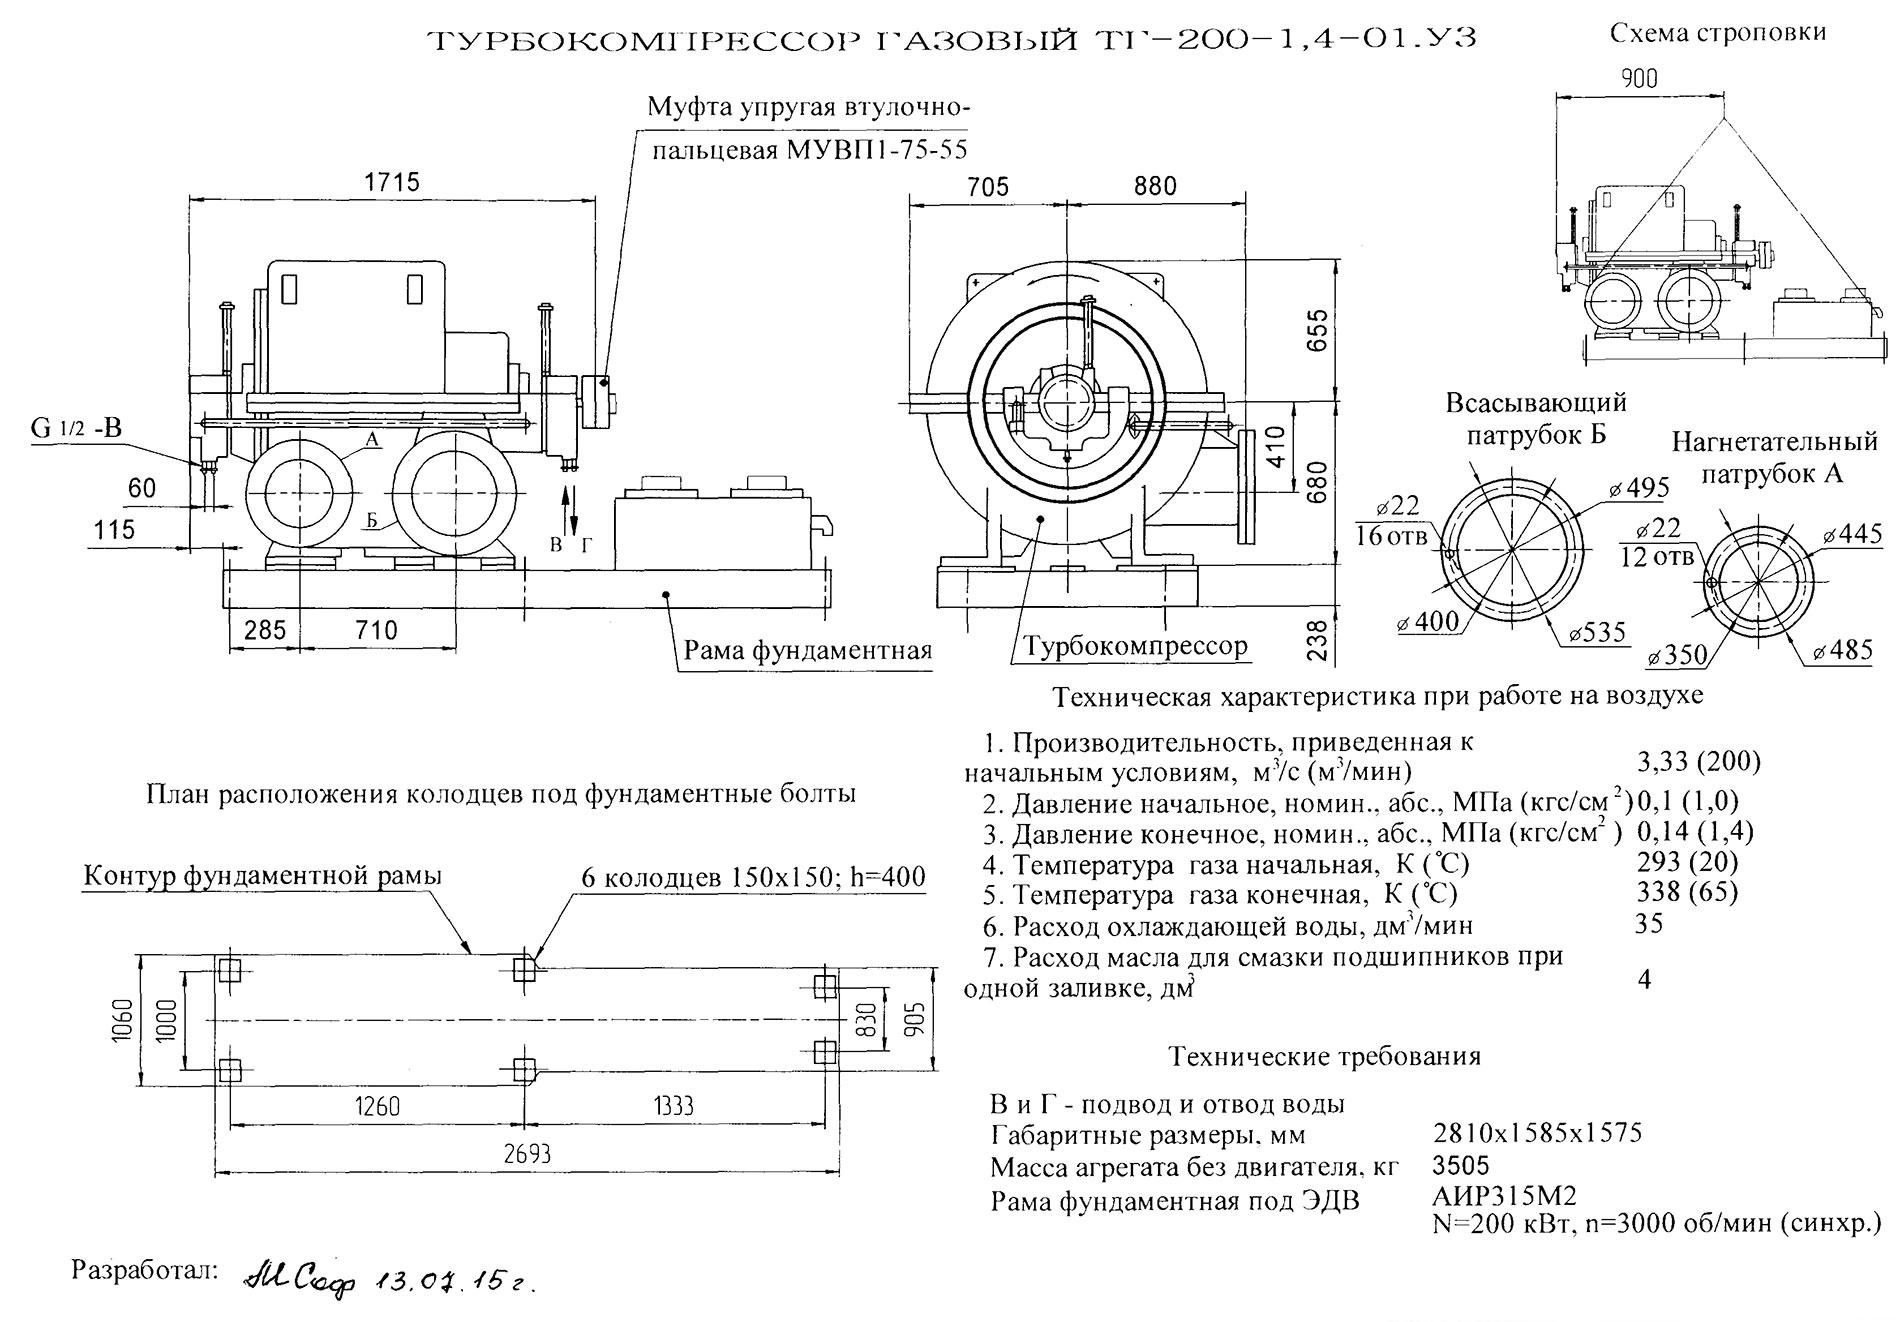 Характеристики ТГ-200-1,4